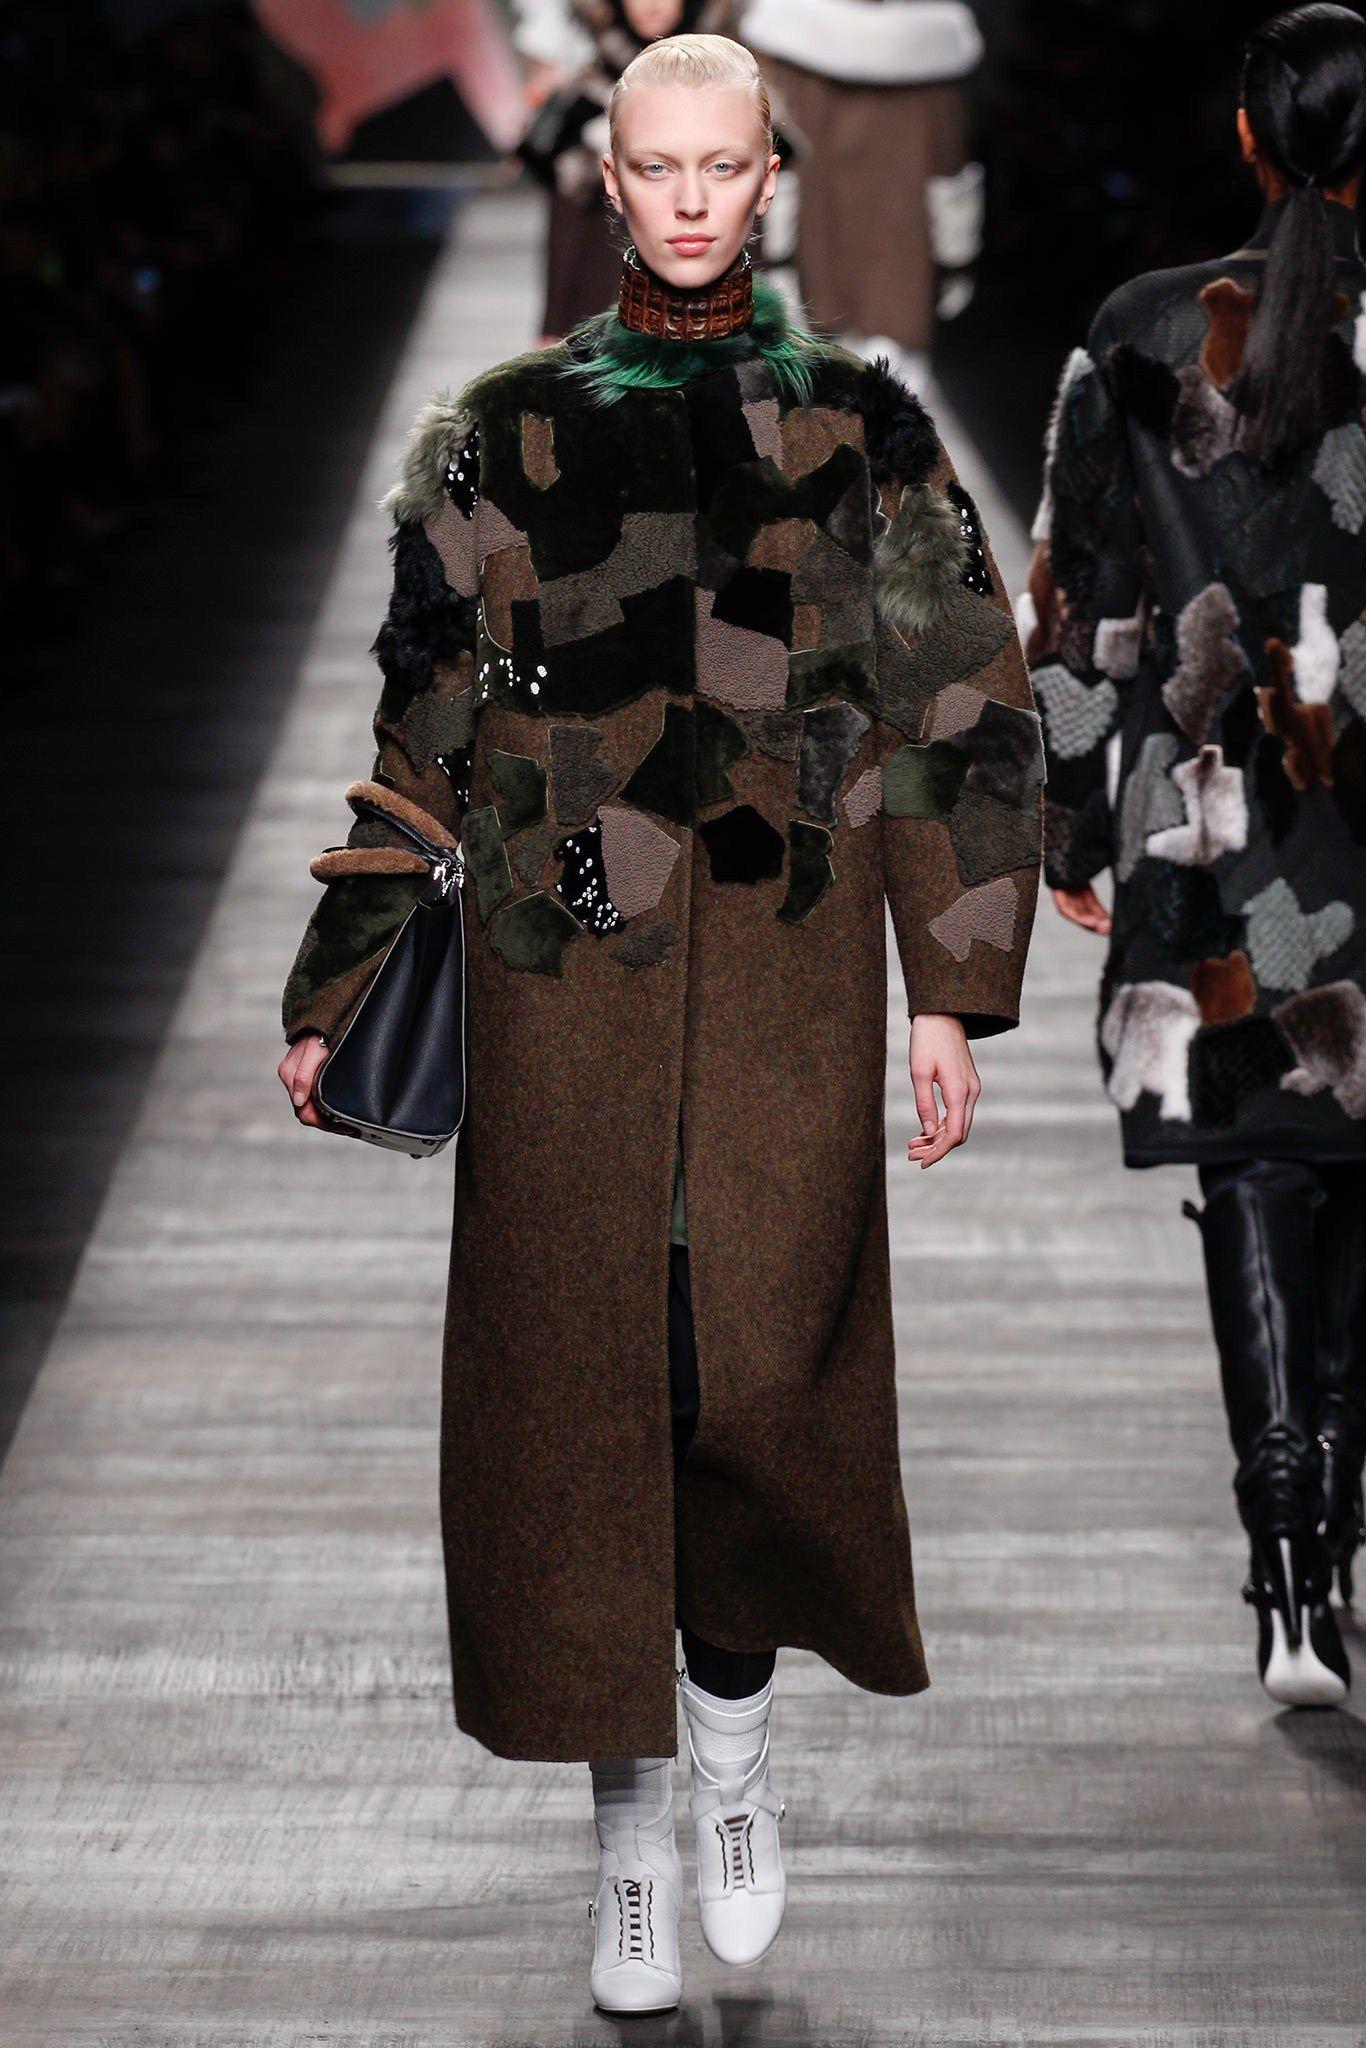 Fendi Fall 2014 Ready-to-Wear Fashion Show - Juliana Schurig